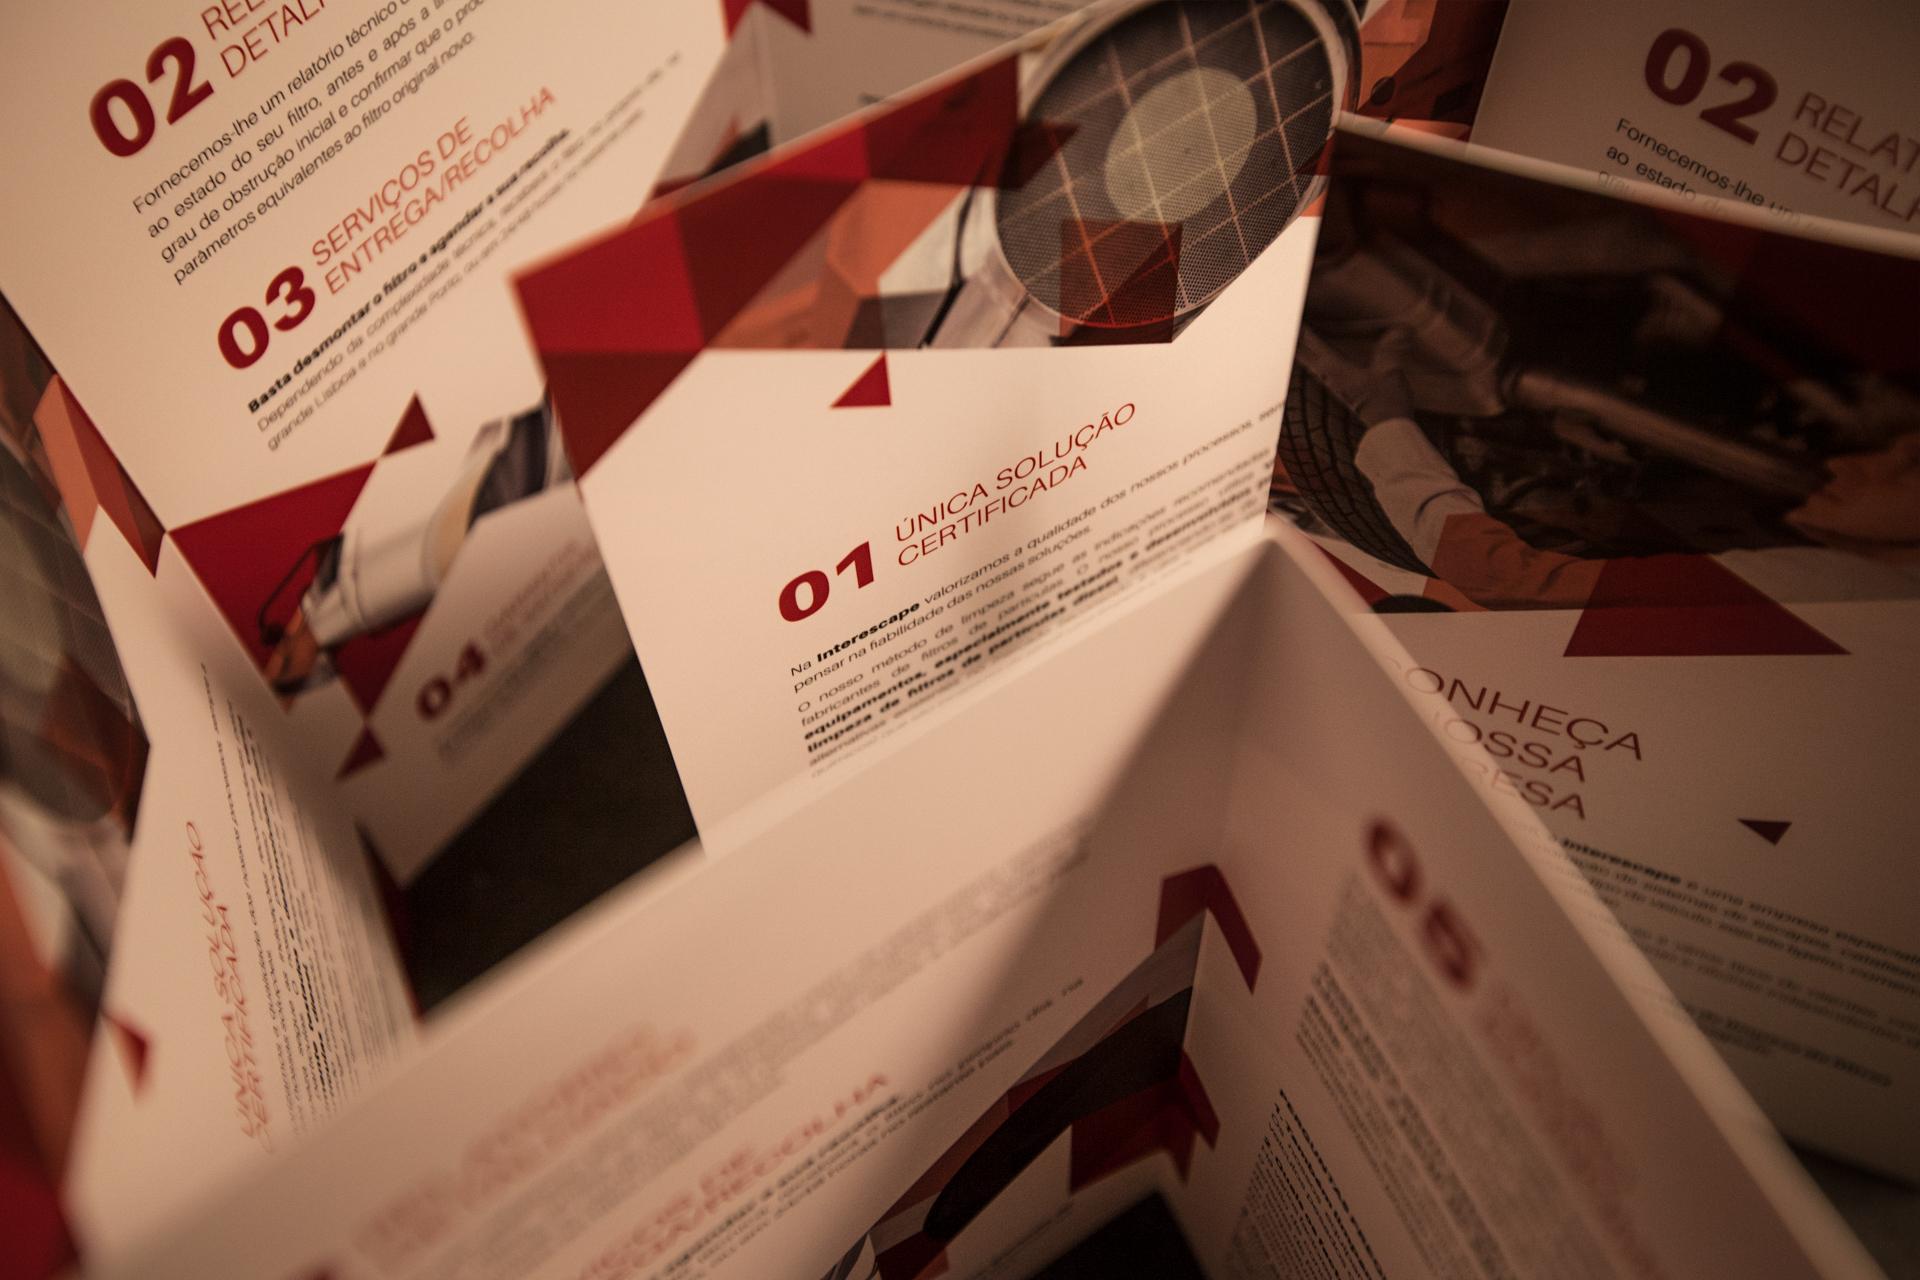 interescape ieservice flyer graphic design grafico branding identidade iepower ieparts ieclassic ietech bonjourmolotov 02.jpg